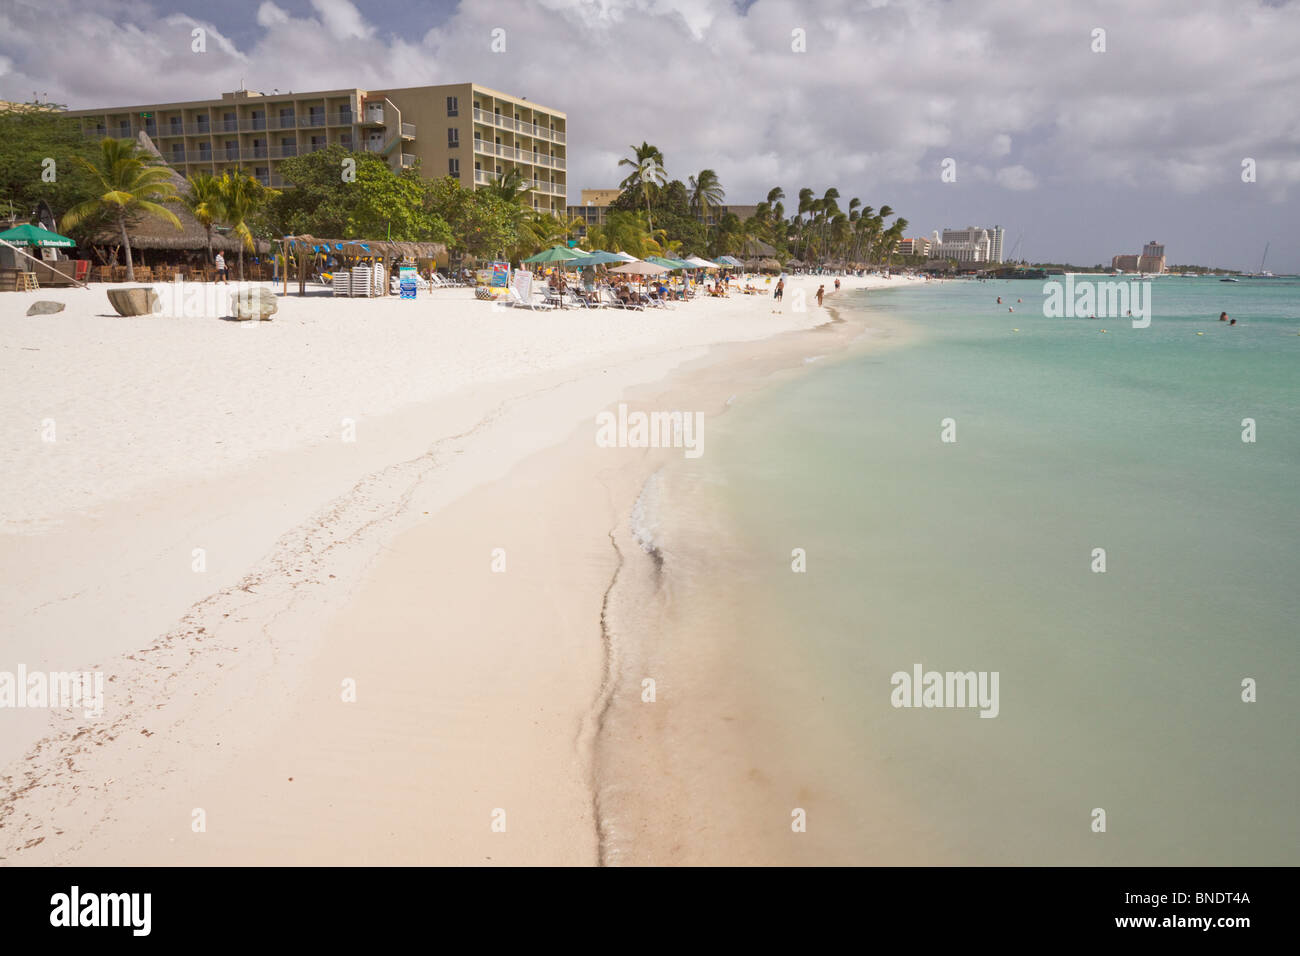 Beautiful calm blue waters at beach in Aruba - Stock Image